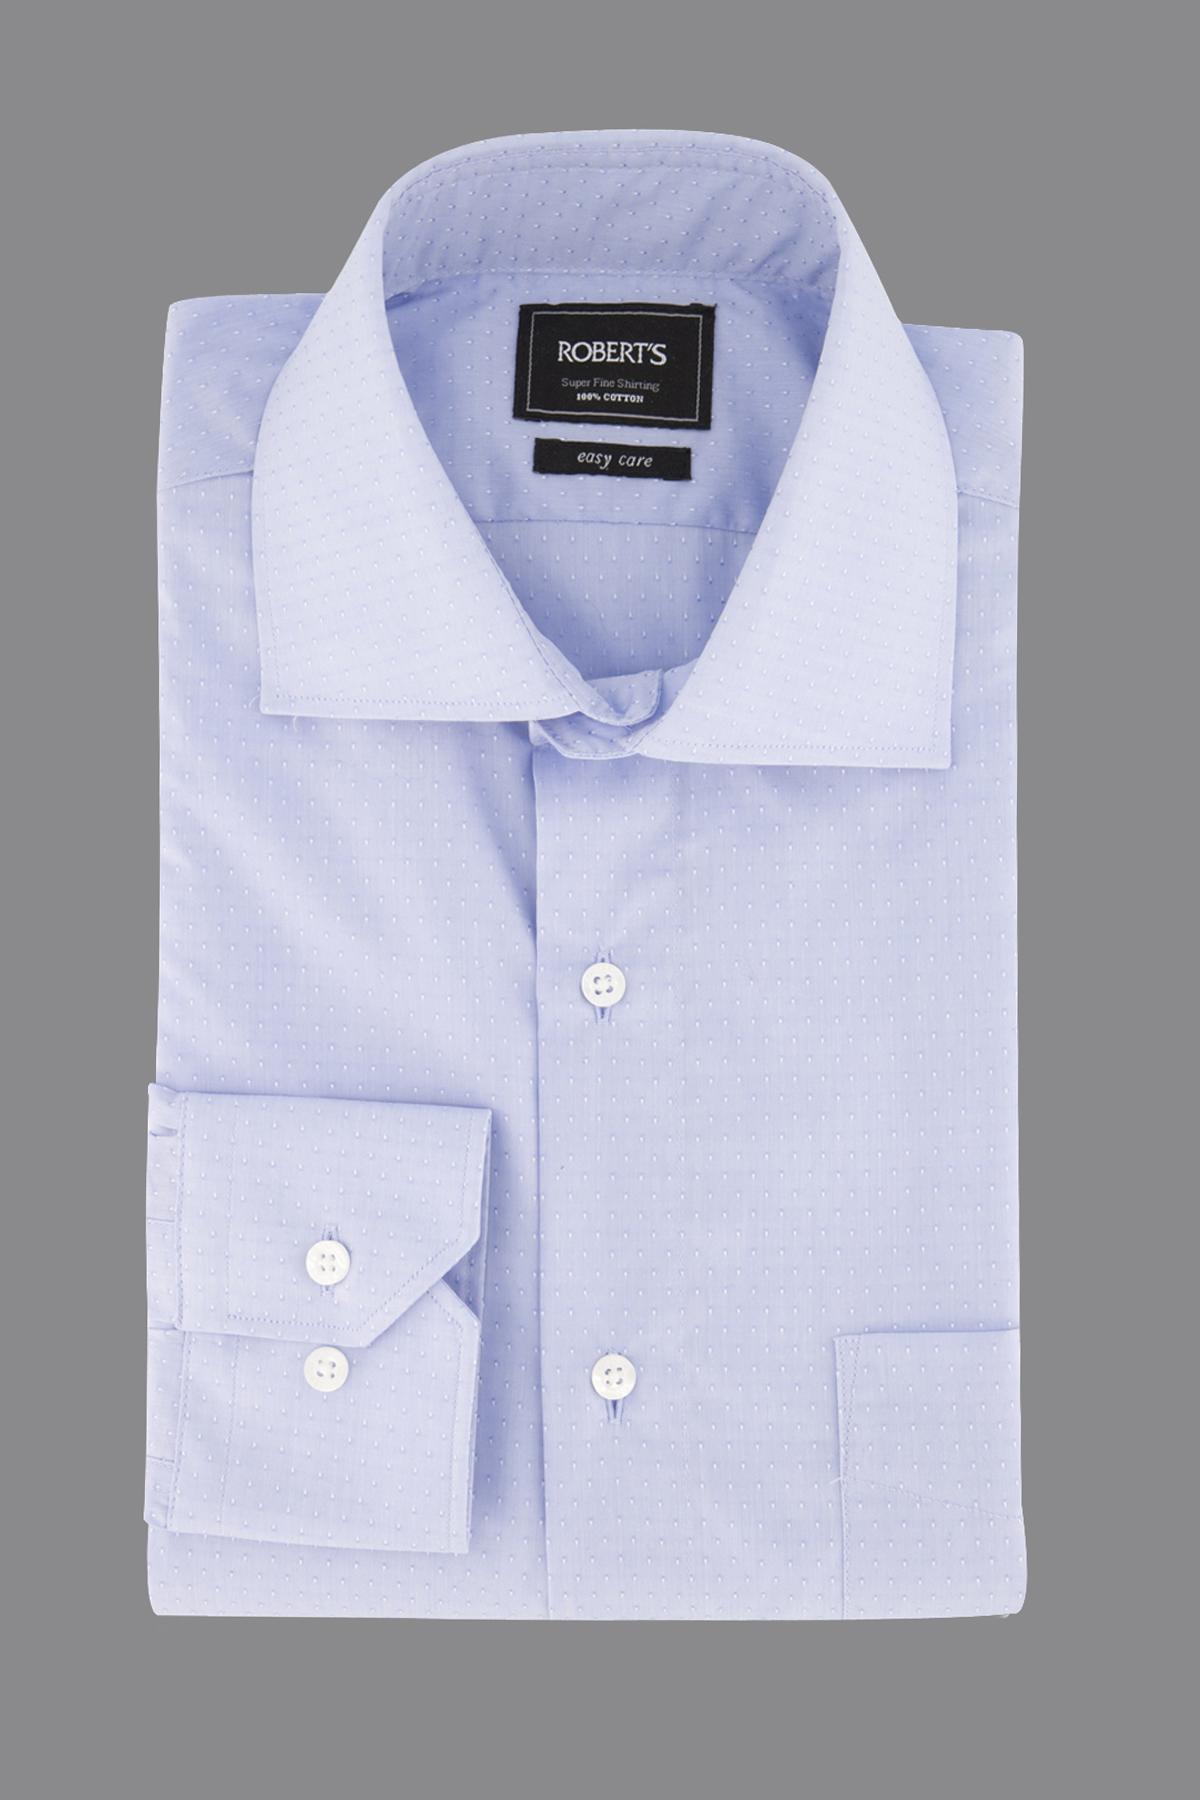 "Camisa Robert´s,  Regular fit, Easy Care"" jacquard celeste"